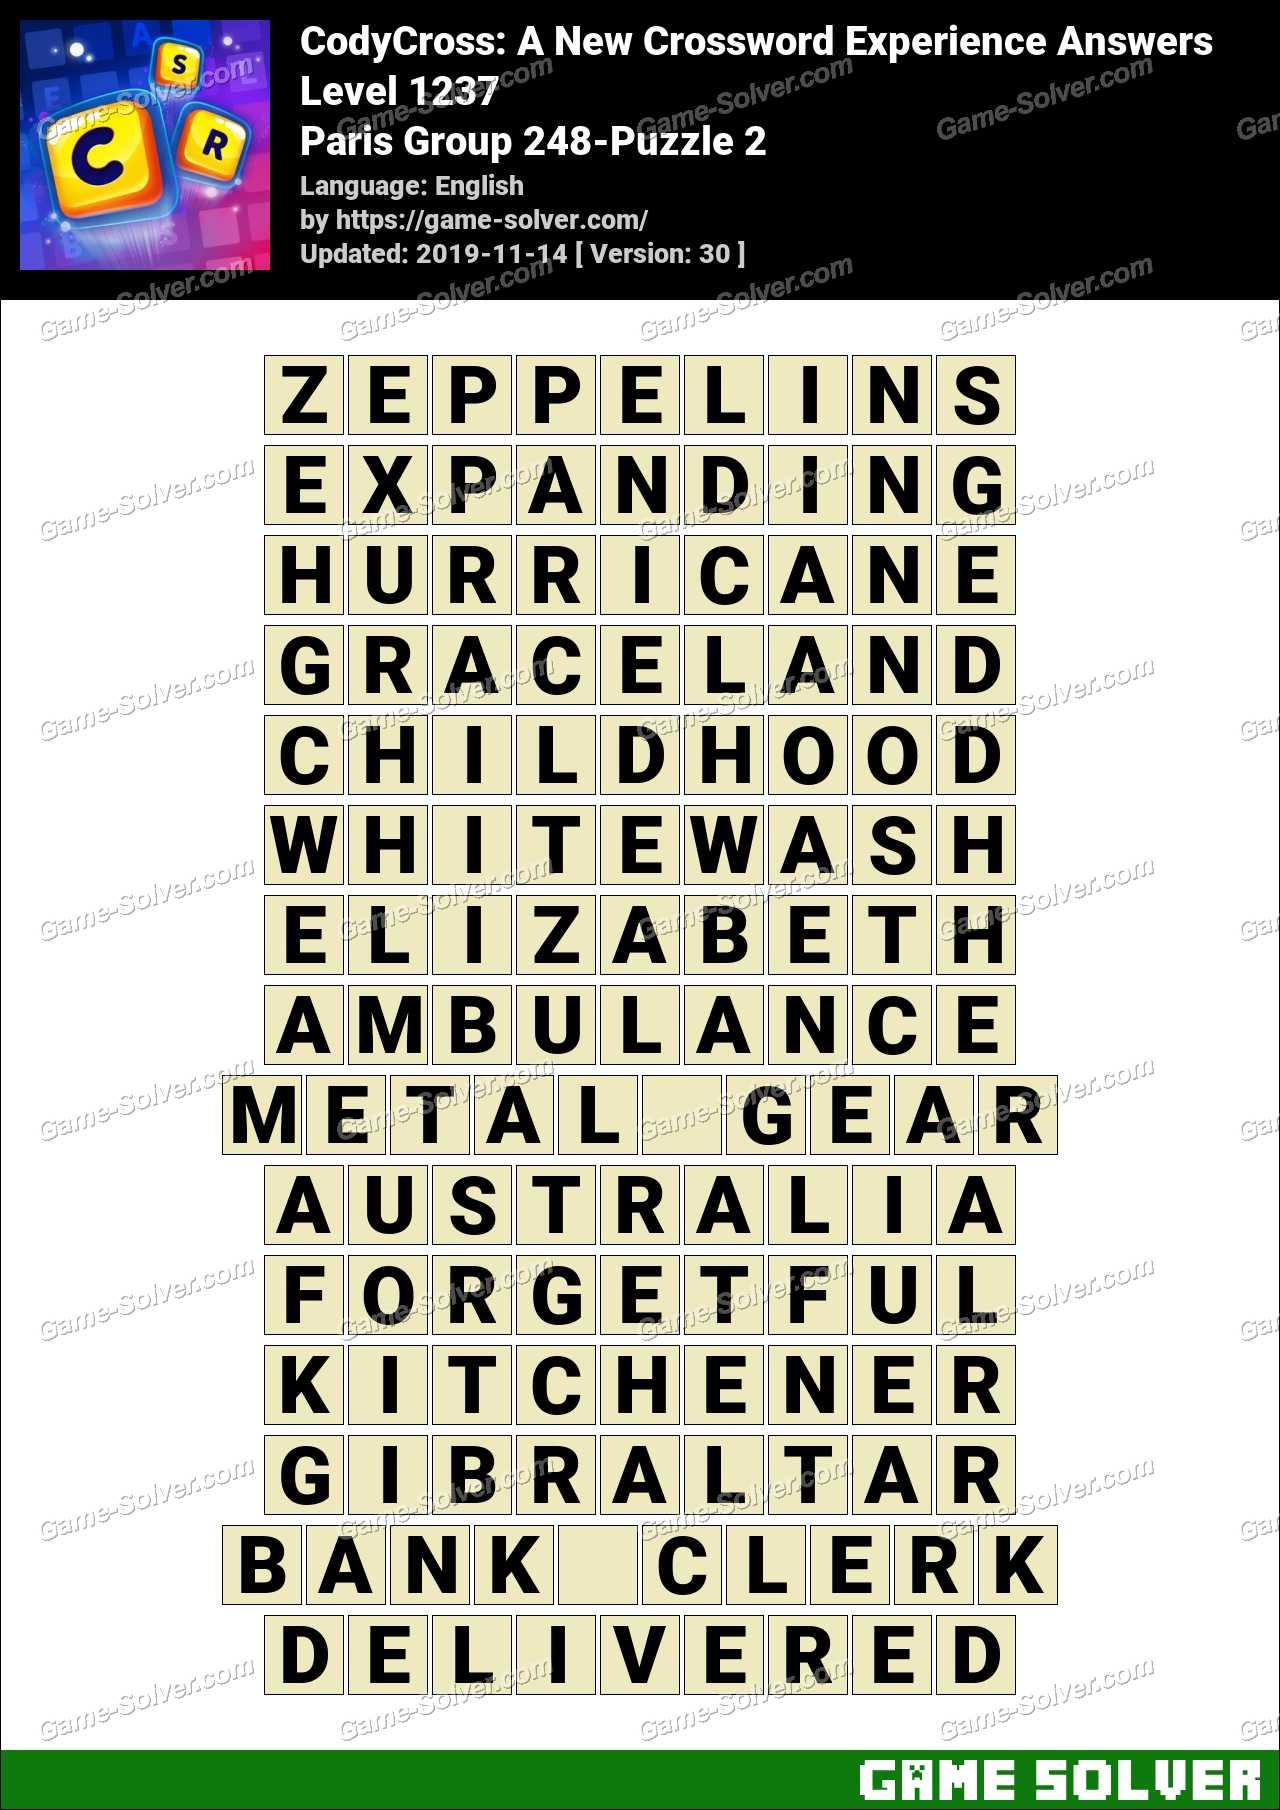 CodyCross Paris Group 248-Puzzle 2 Answers